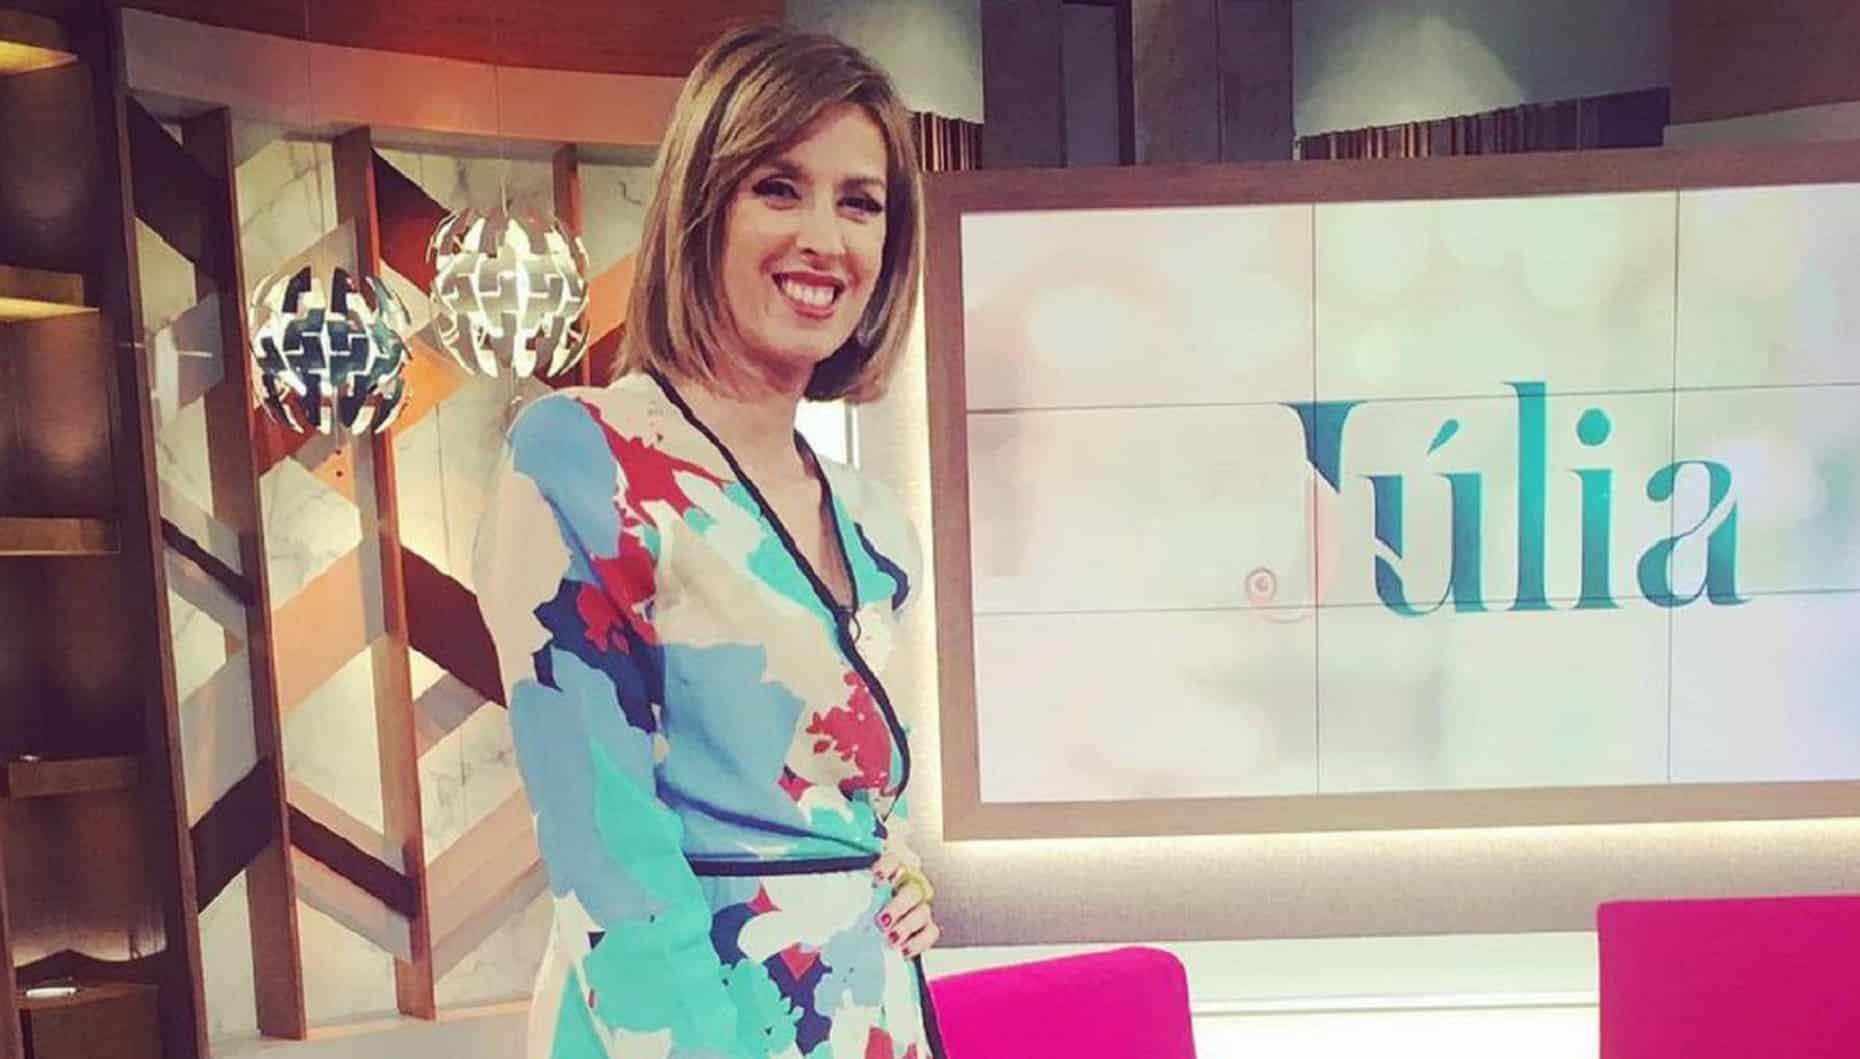 Ana Marques